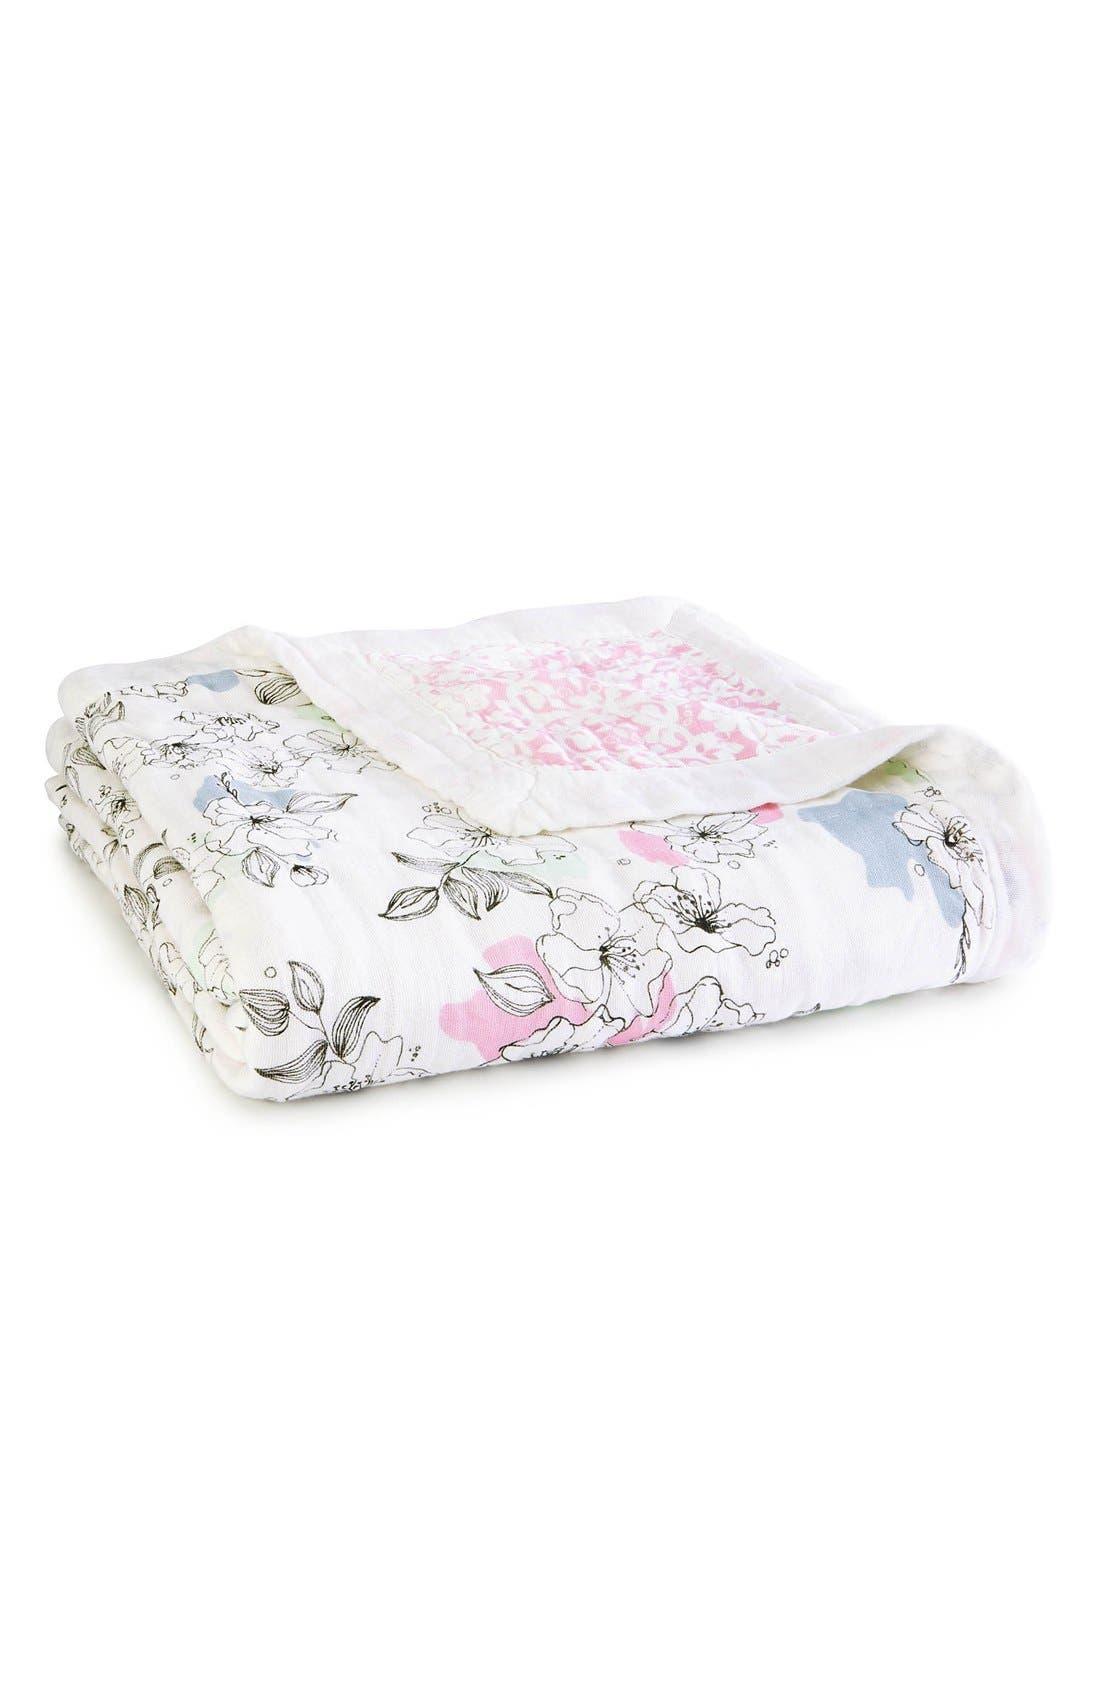 'Silky Soft Dream' Blanket,                         Main,                         color, Grey